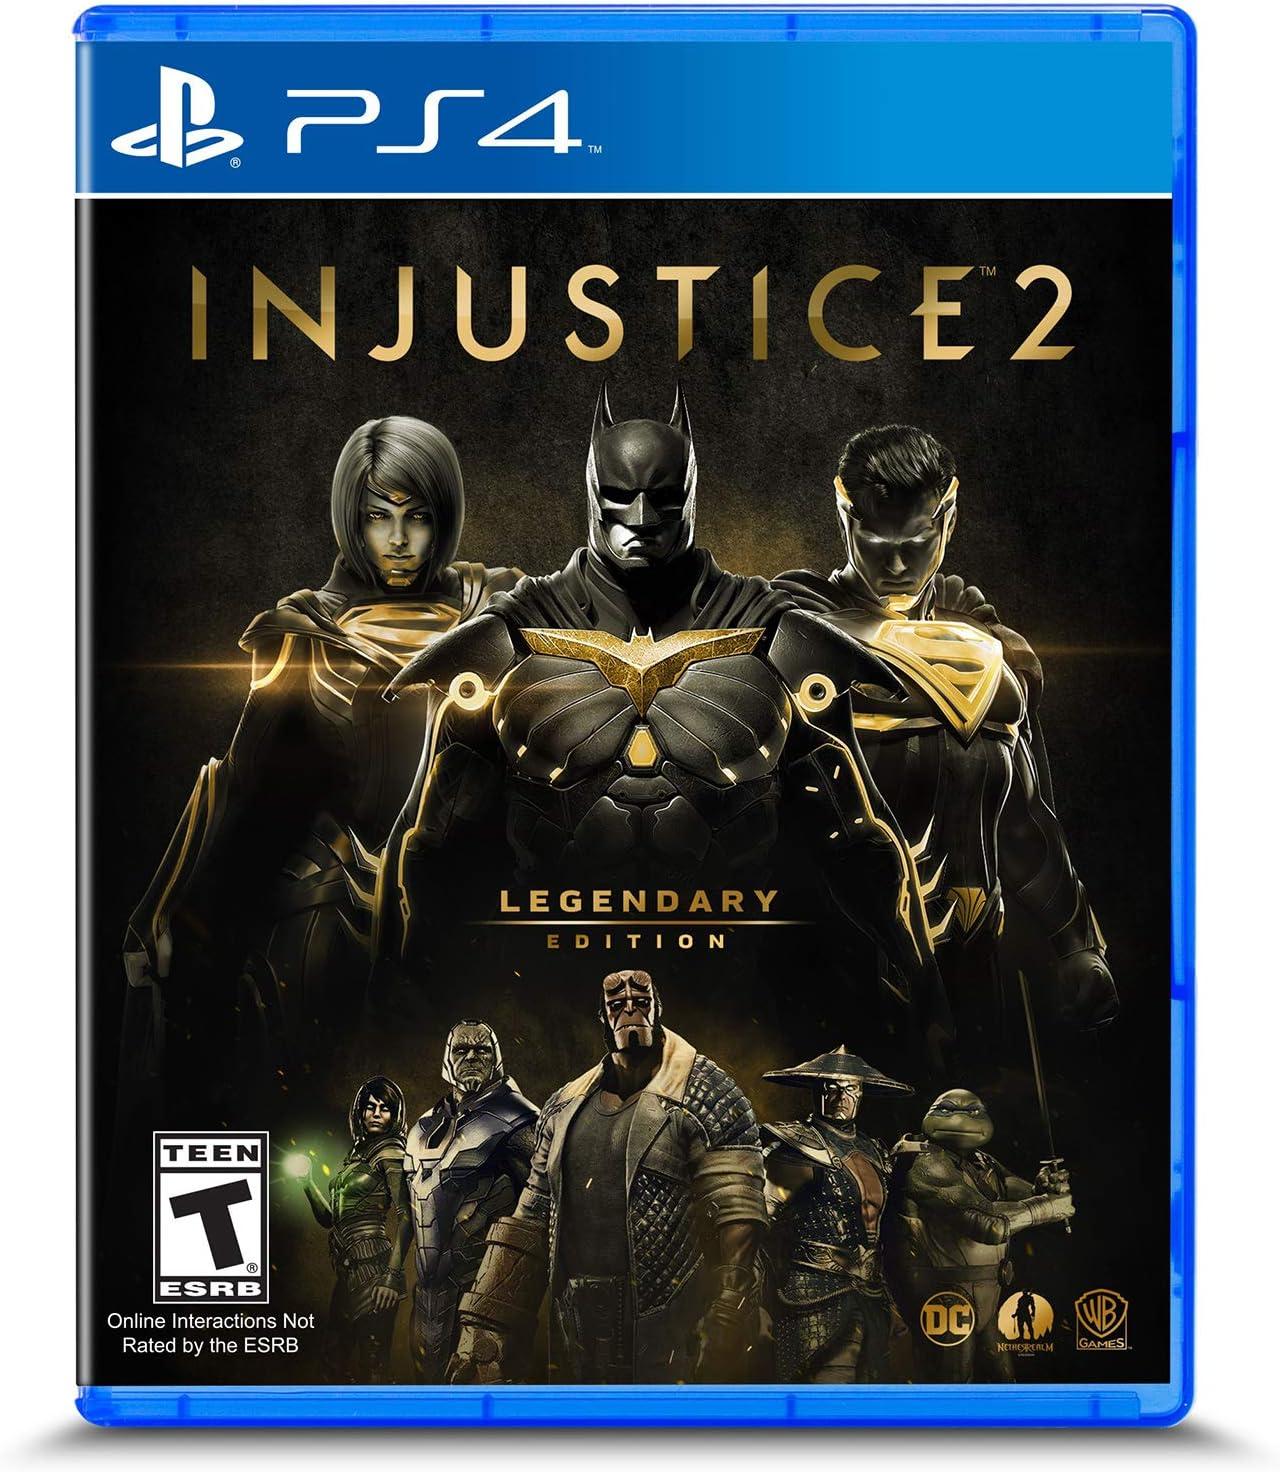 Amazon.com: Injustice 2: Legendary Edition - PlayStation 4 ...